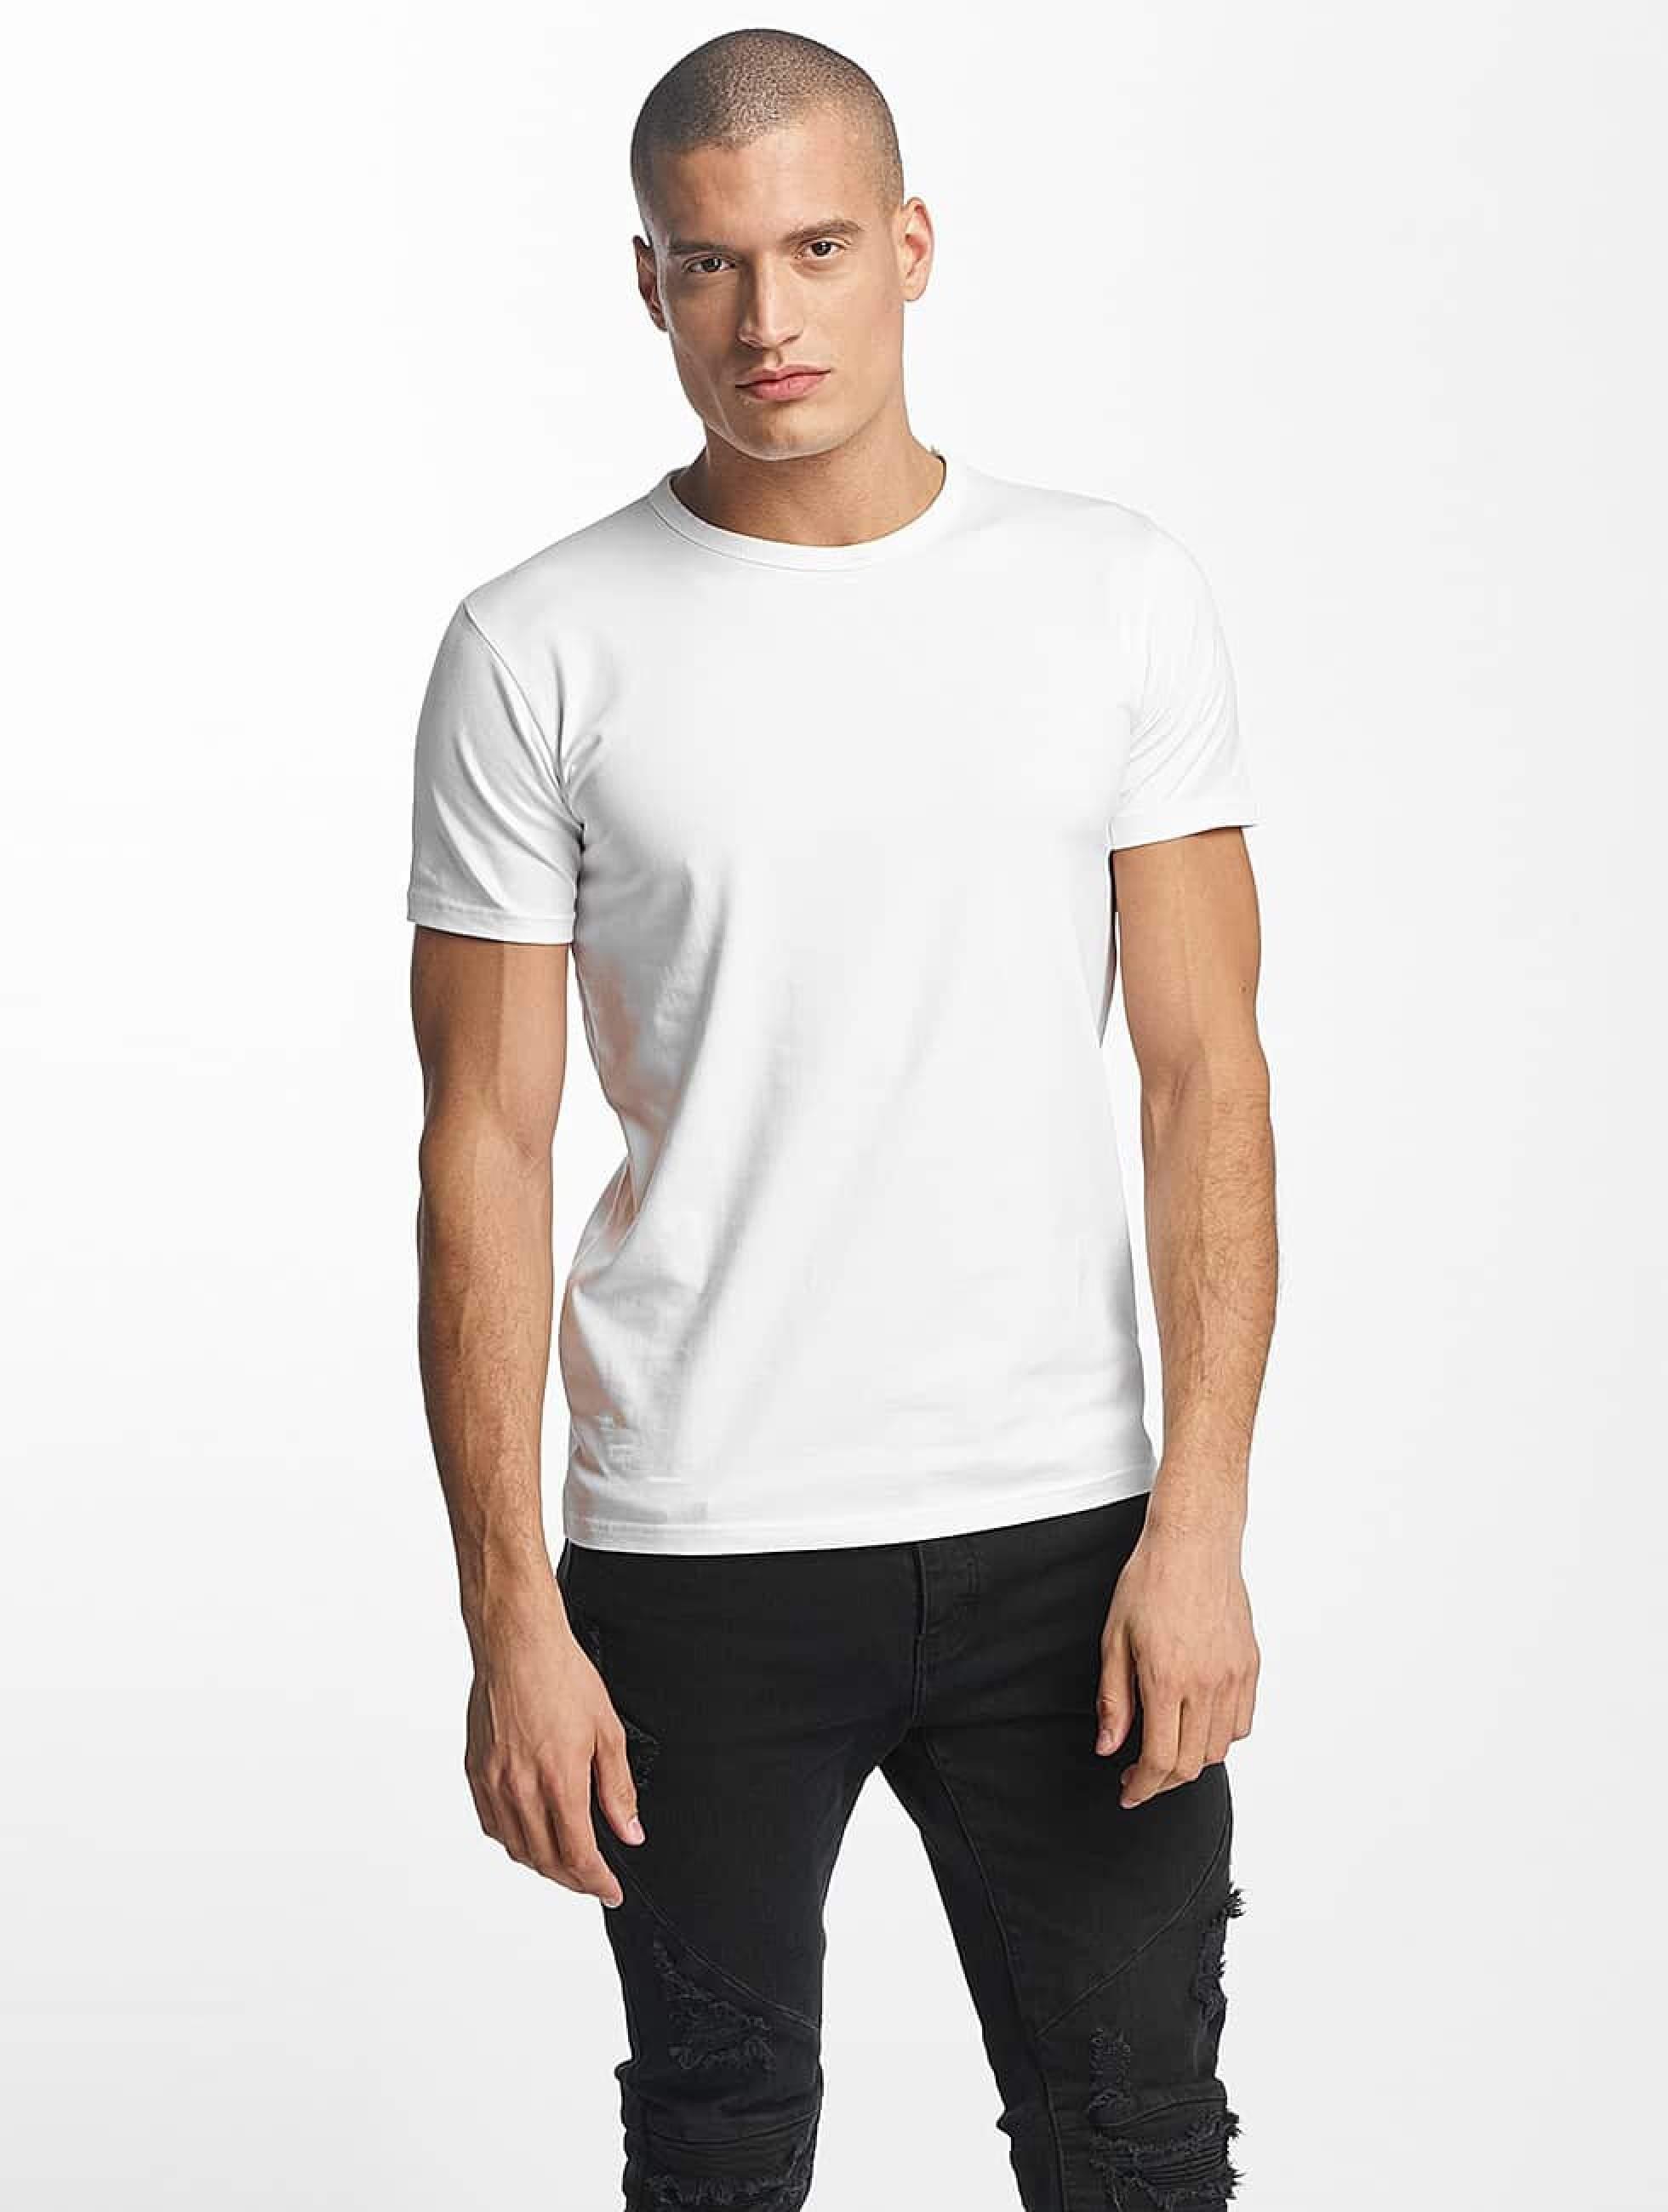 Cyprime / T-Shirt Basic in white XL